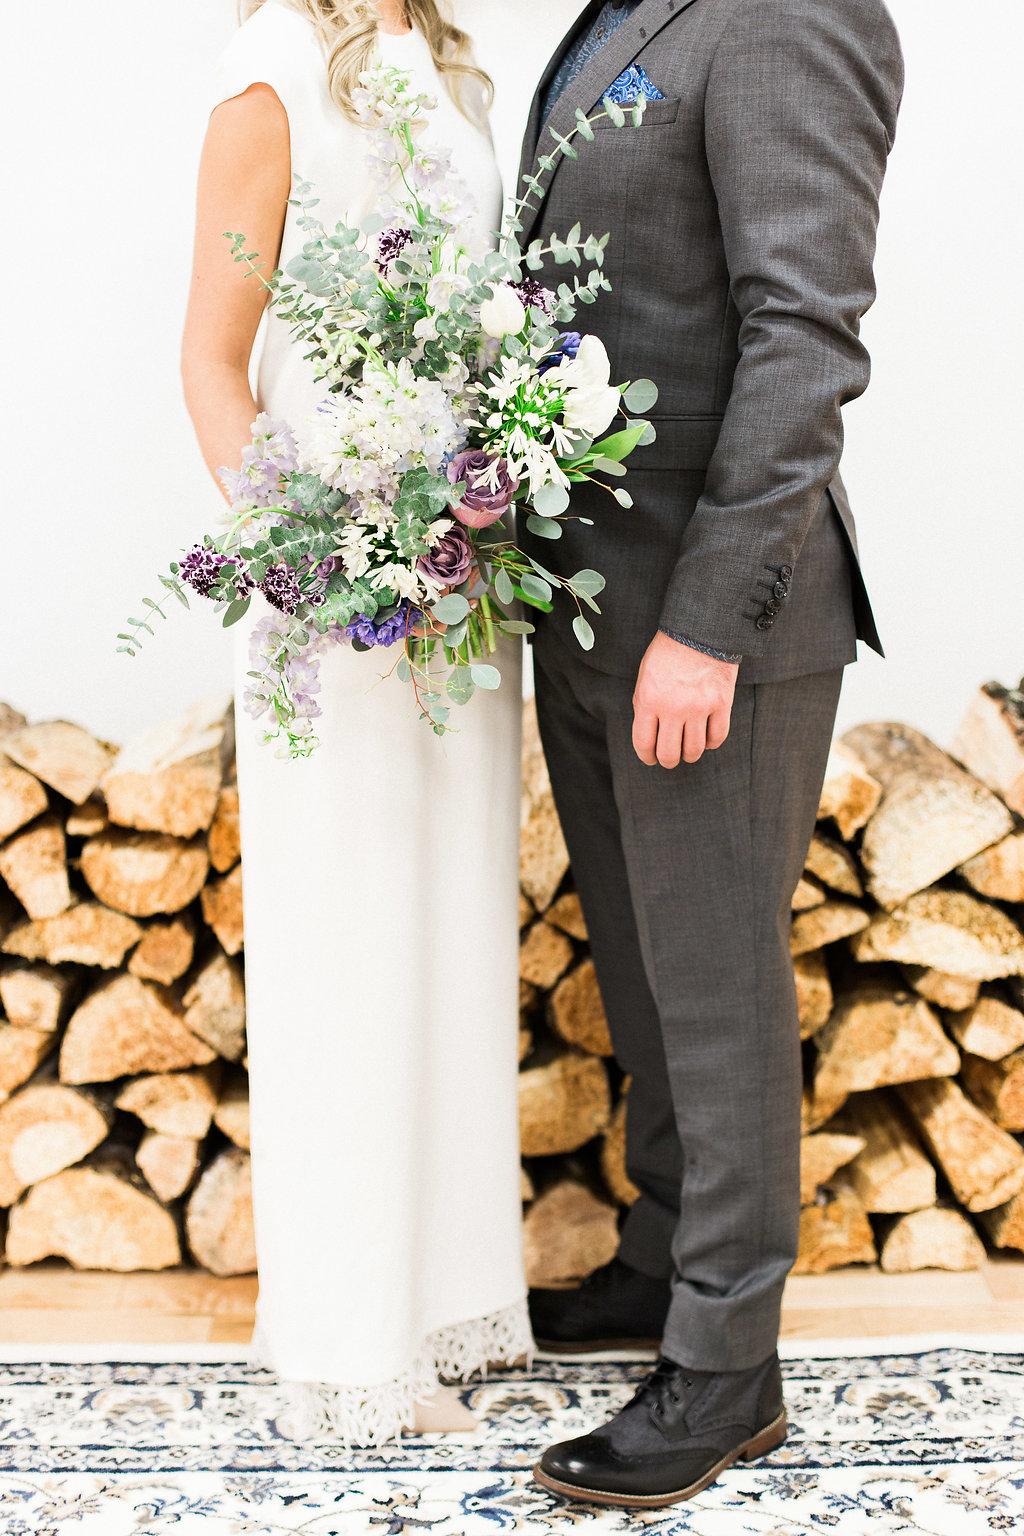 Intimate Weddings in Winnipeg - Stone House Creative